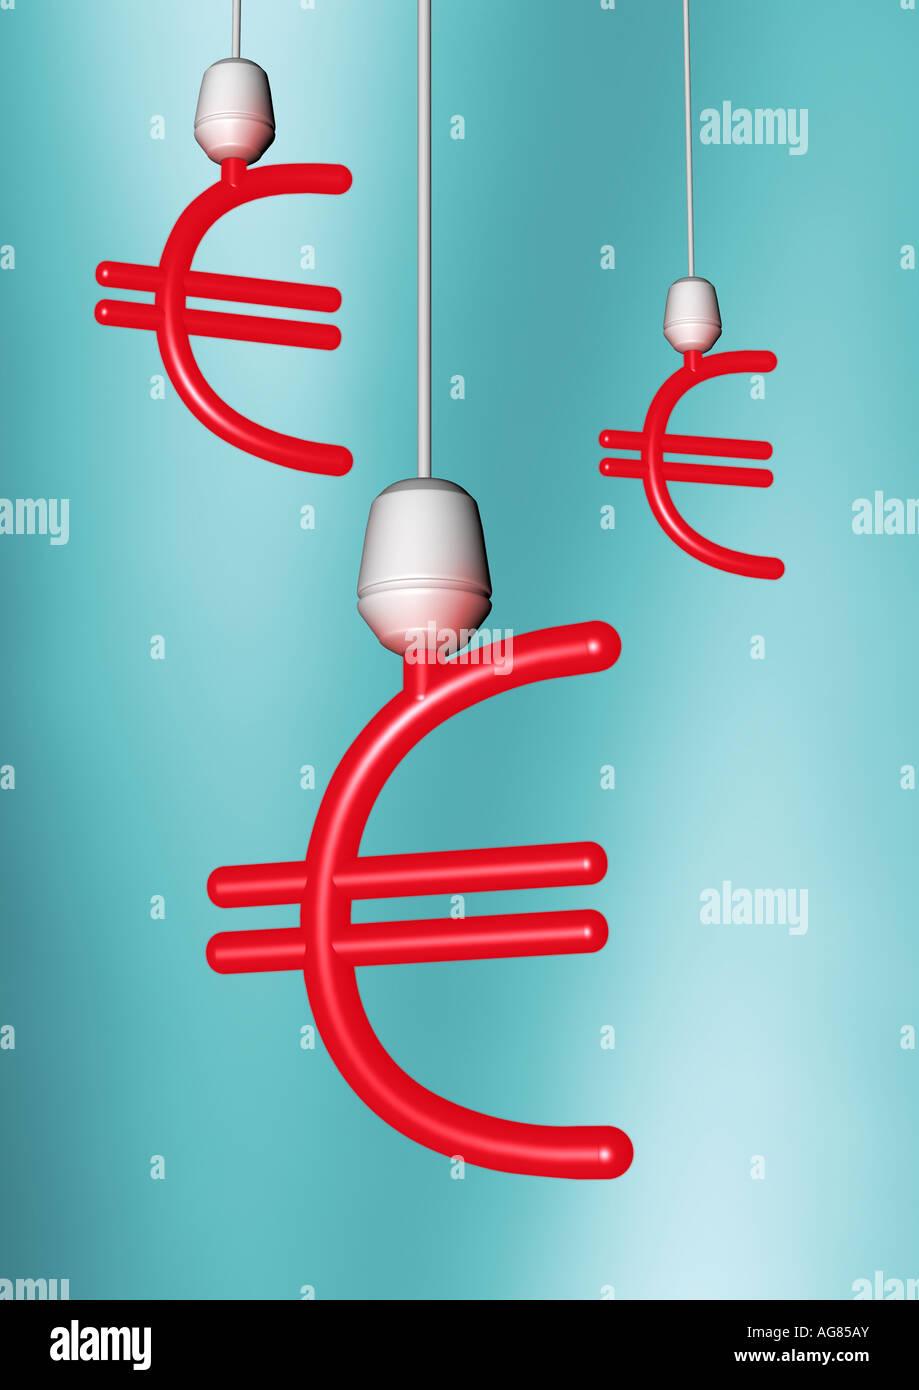 energy saving lamp Energiesparlampe - Stock Image